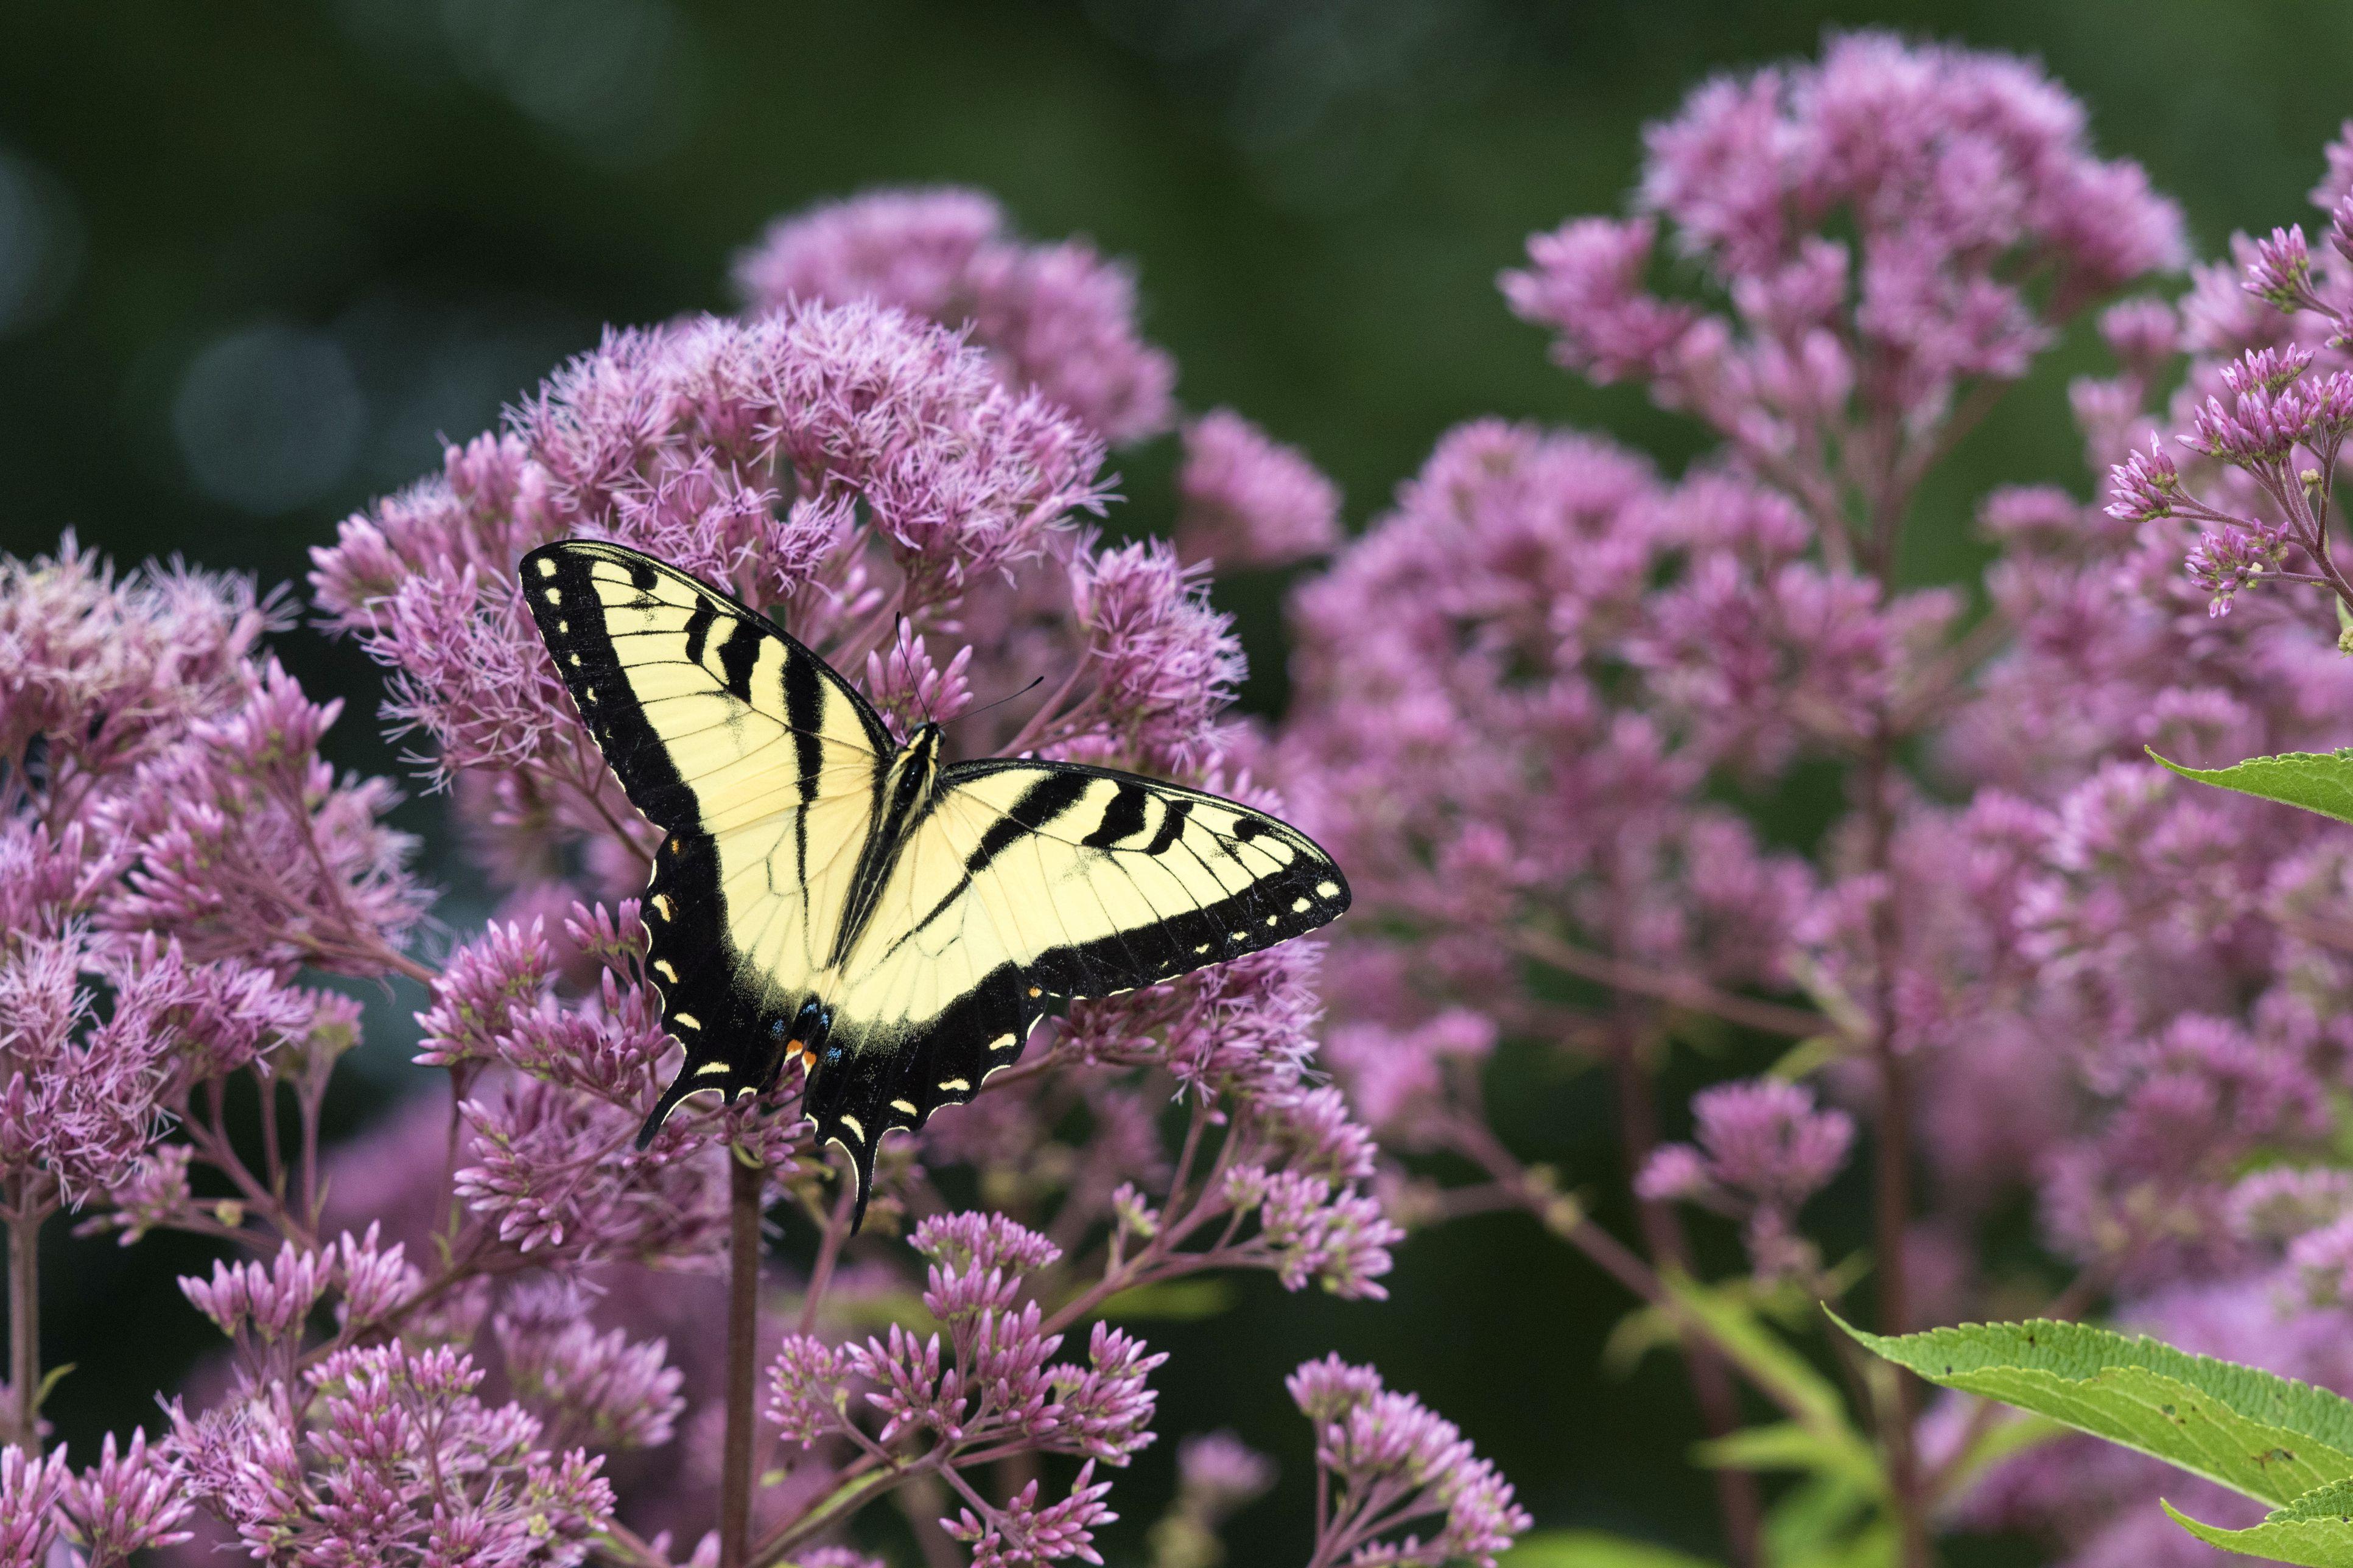 Eastern Tiger Swallowtail (Papilio glaucaus) feeding on Joe Pye Weed (Eutrochium purpureum), Marion County, Illinois, USA